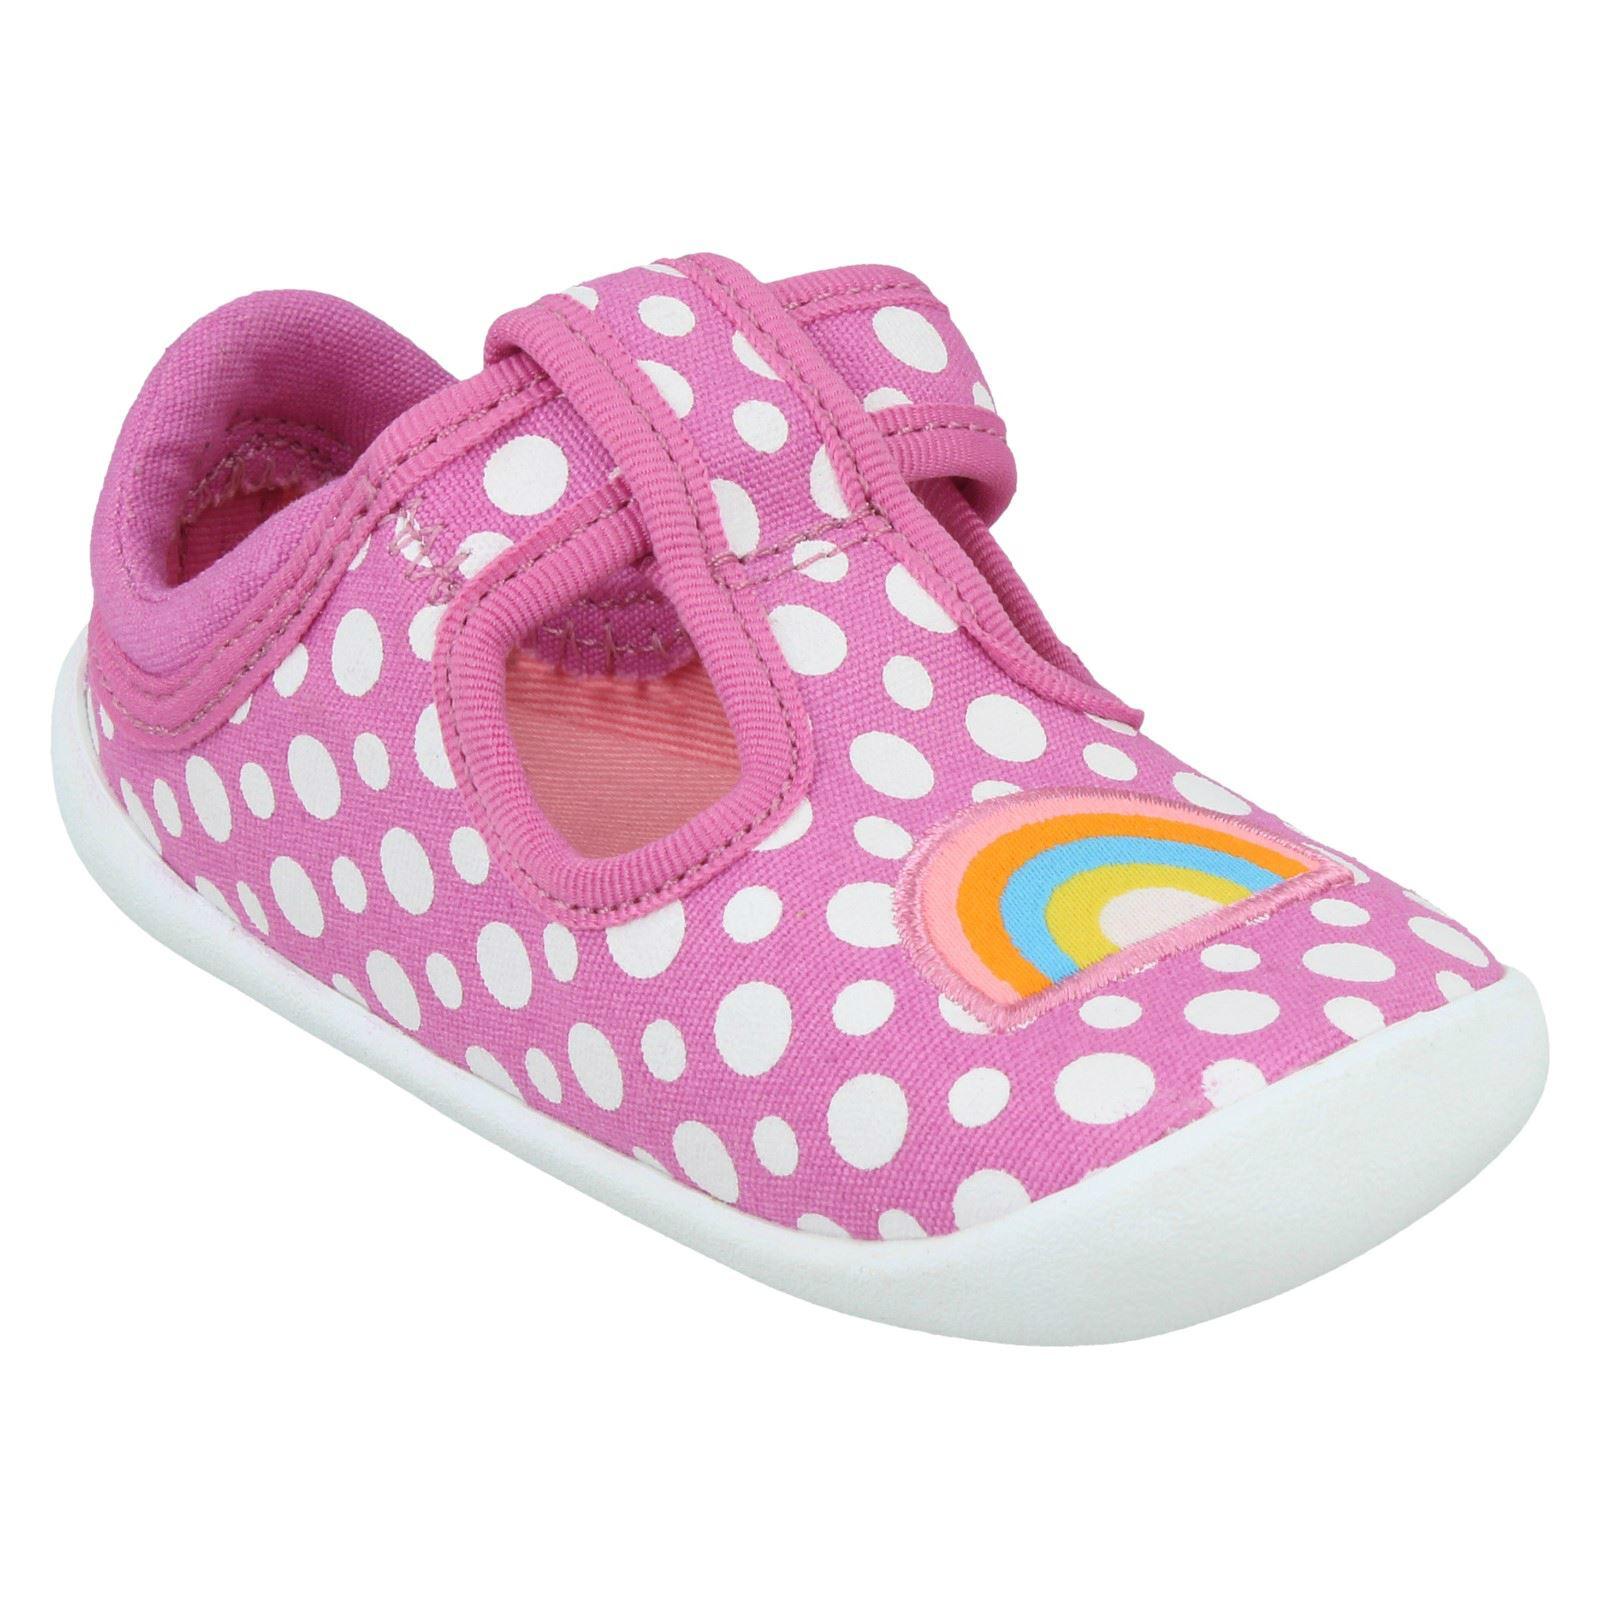 Girls Clarks T Bar Shoe Roamer Sun T